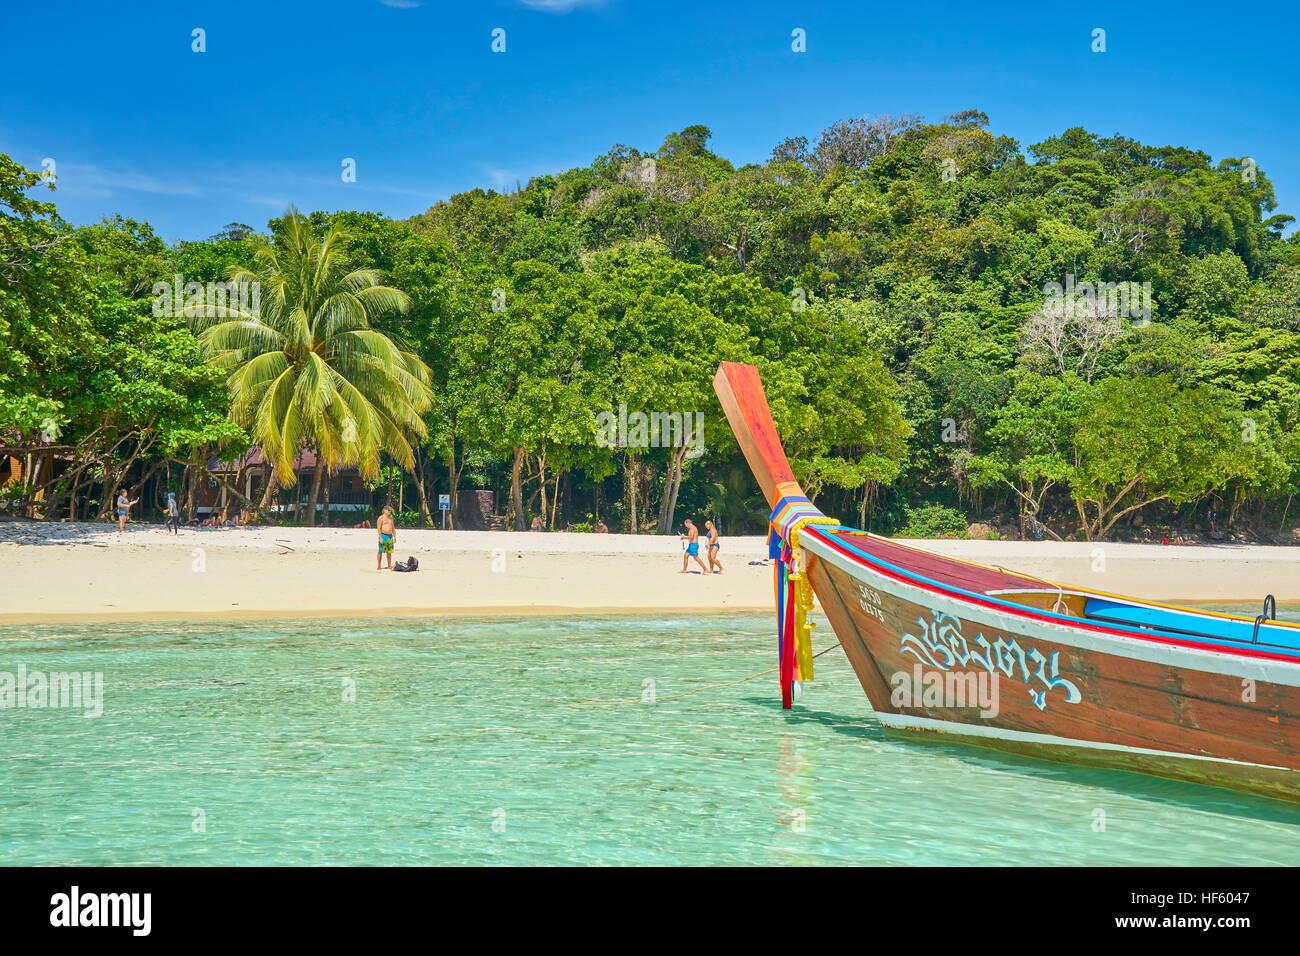 Bu Bu Island Beach, Krabi Province, Thailand - Stock Image